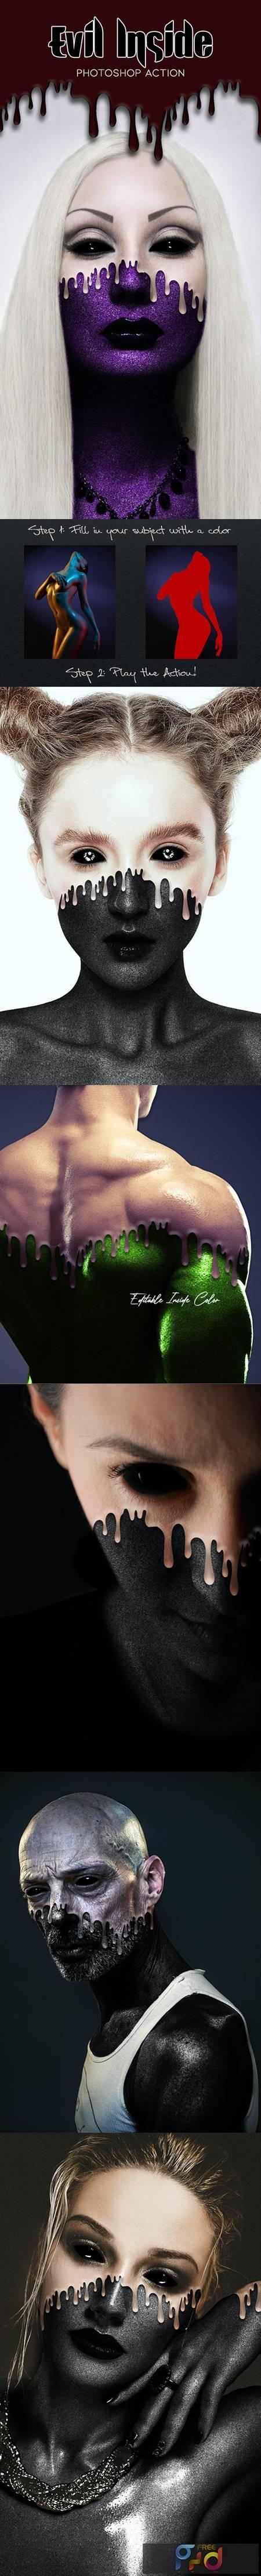 Evil Inside Photoshop Action 28915513 1